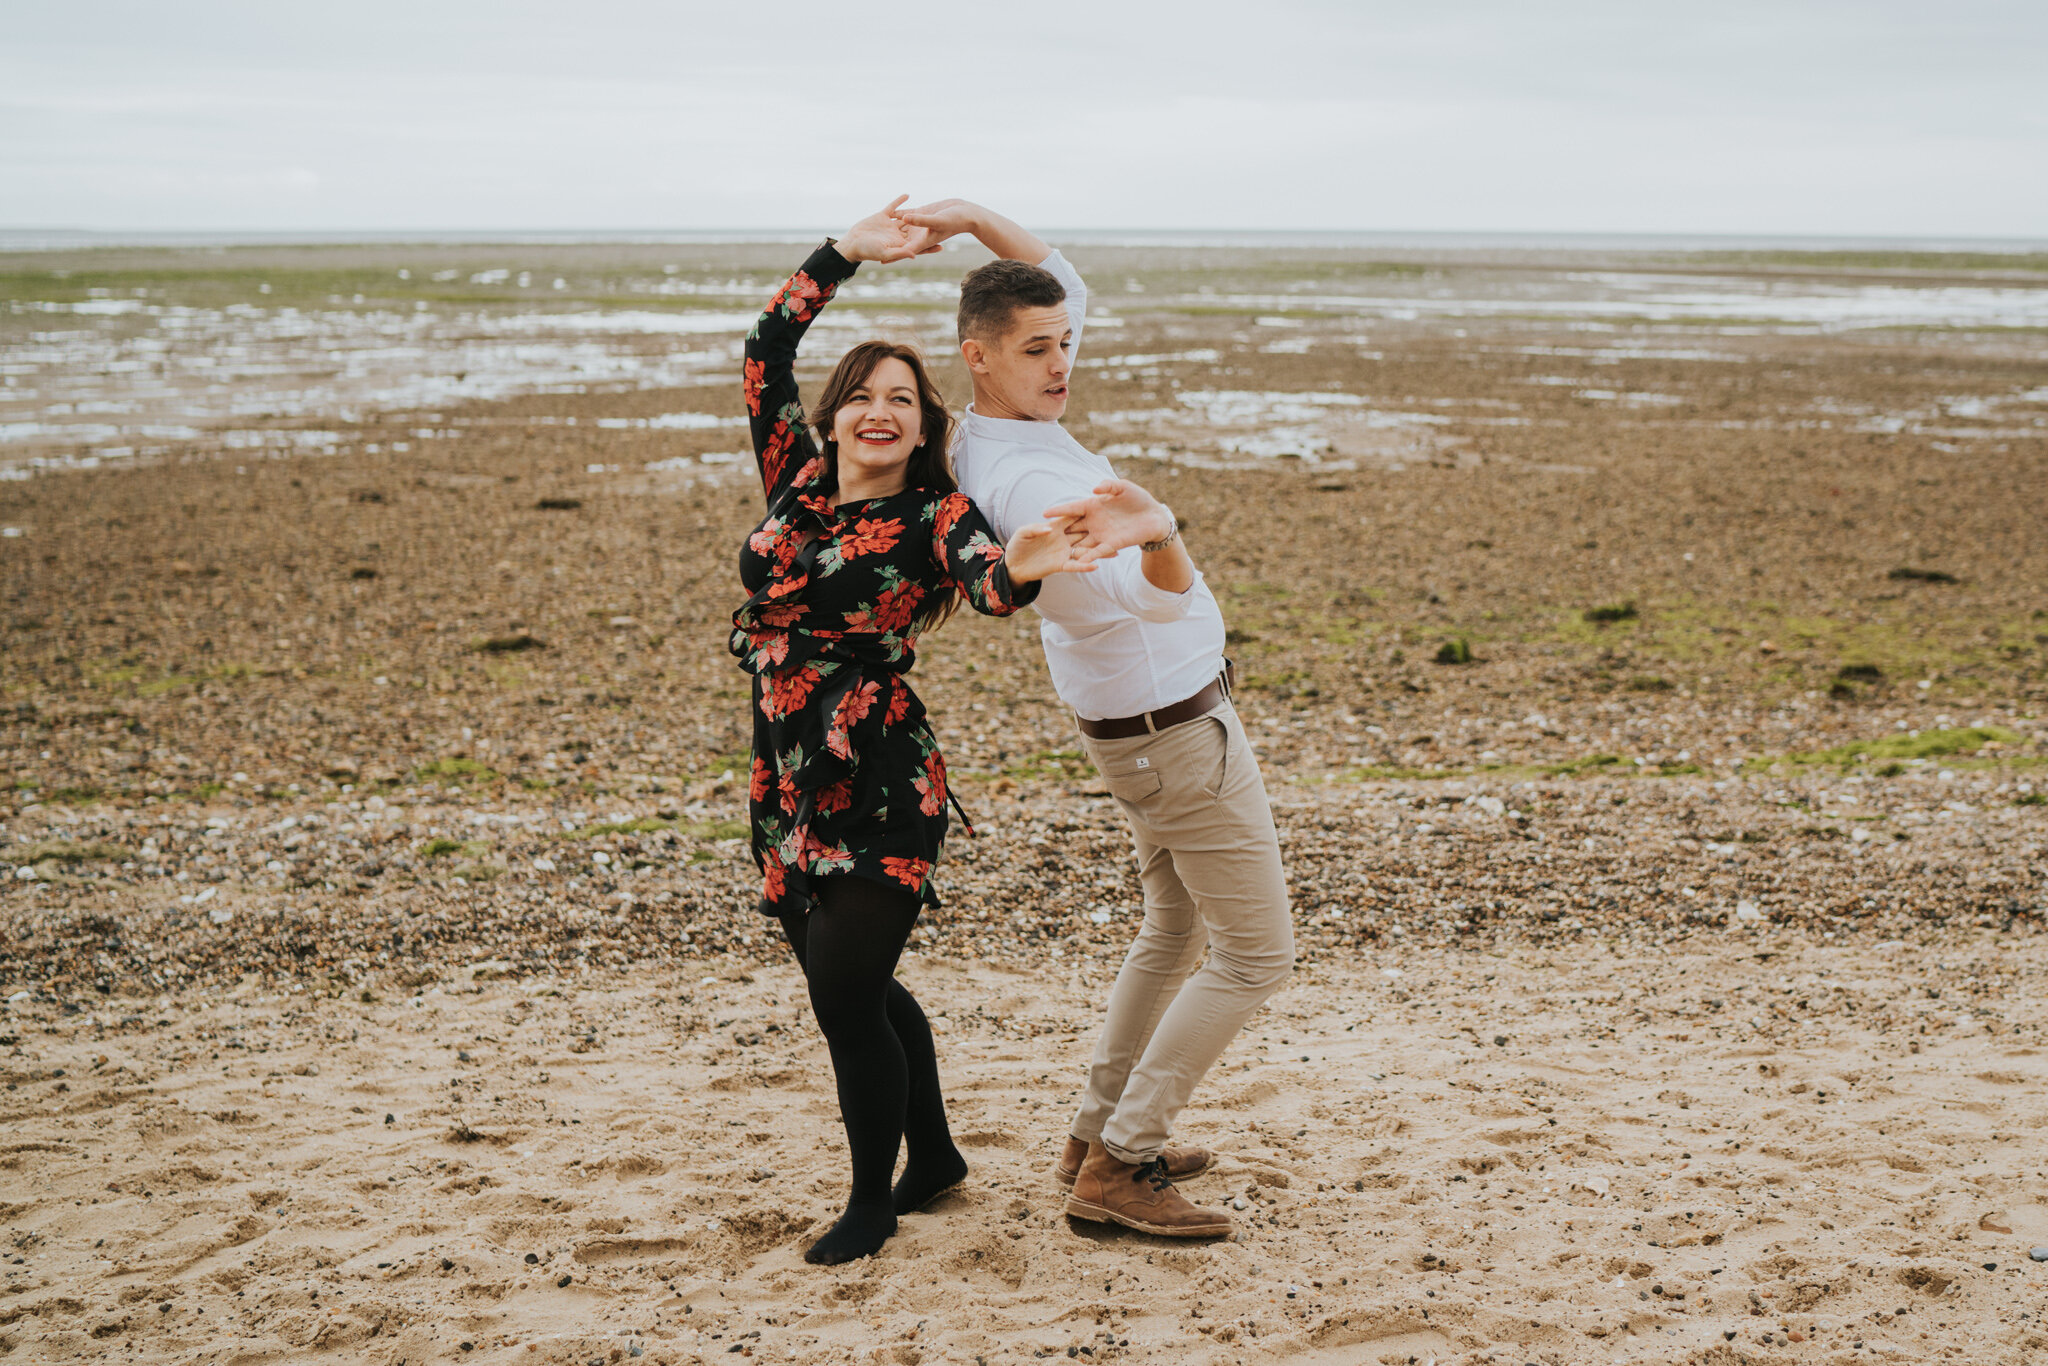 engagement-pre-wedding-hannah-michael-cudmore-grove-east-mersea-grace-elizabeth-colchester-essex-devon-suffolk-and-norfolk-alternative-wedding-and-family-photographer (42 of 51).jpg